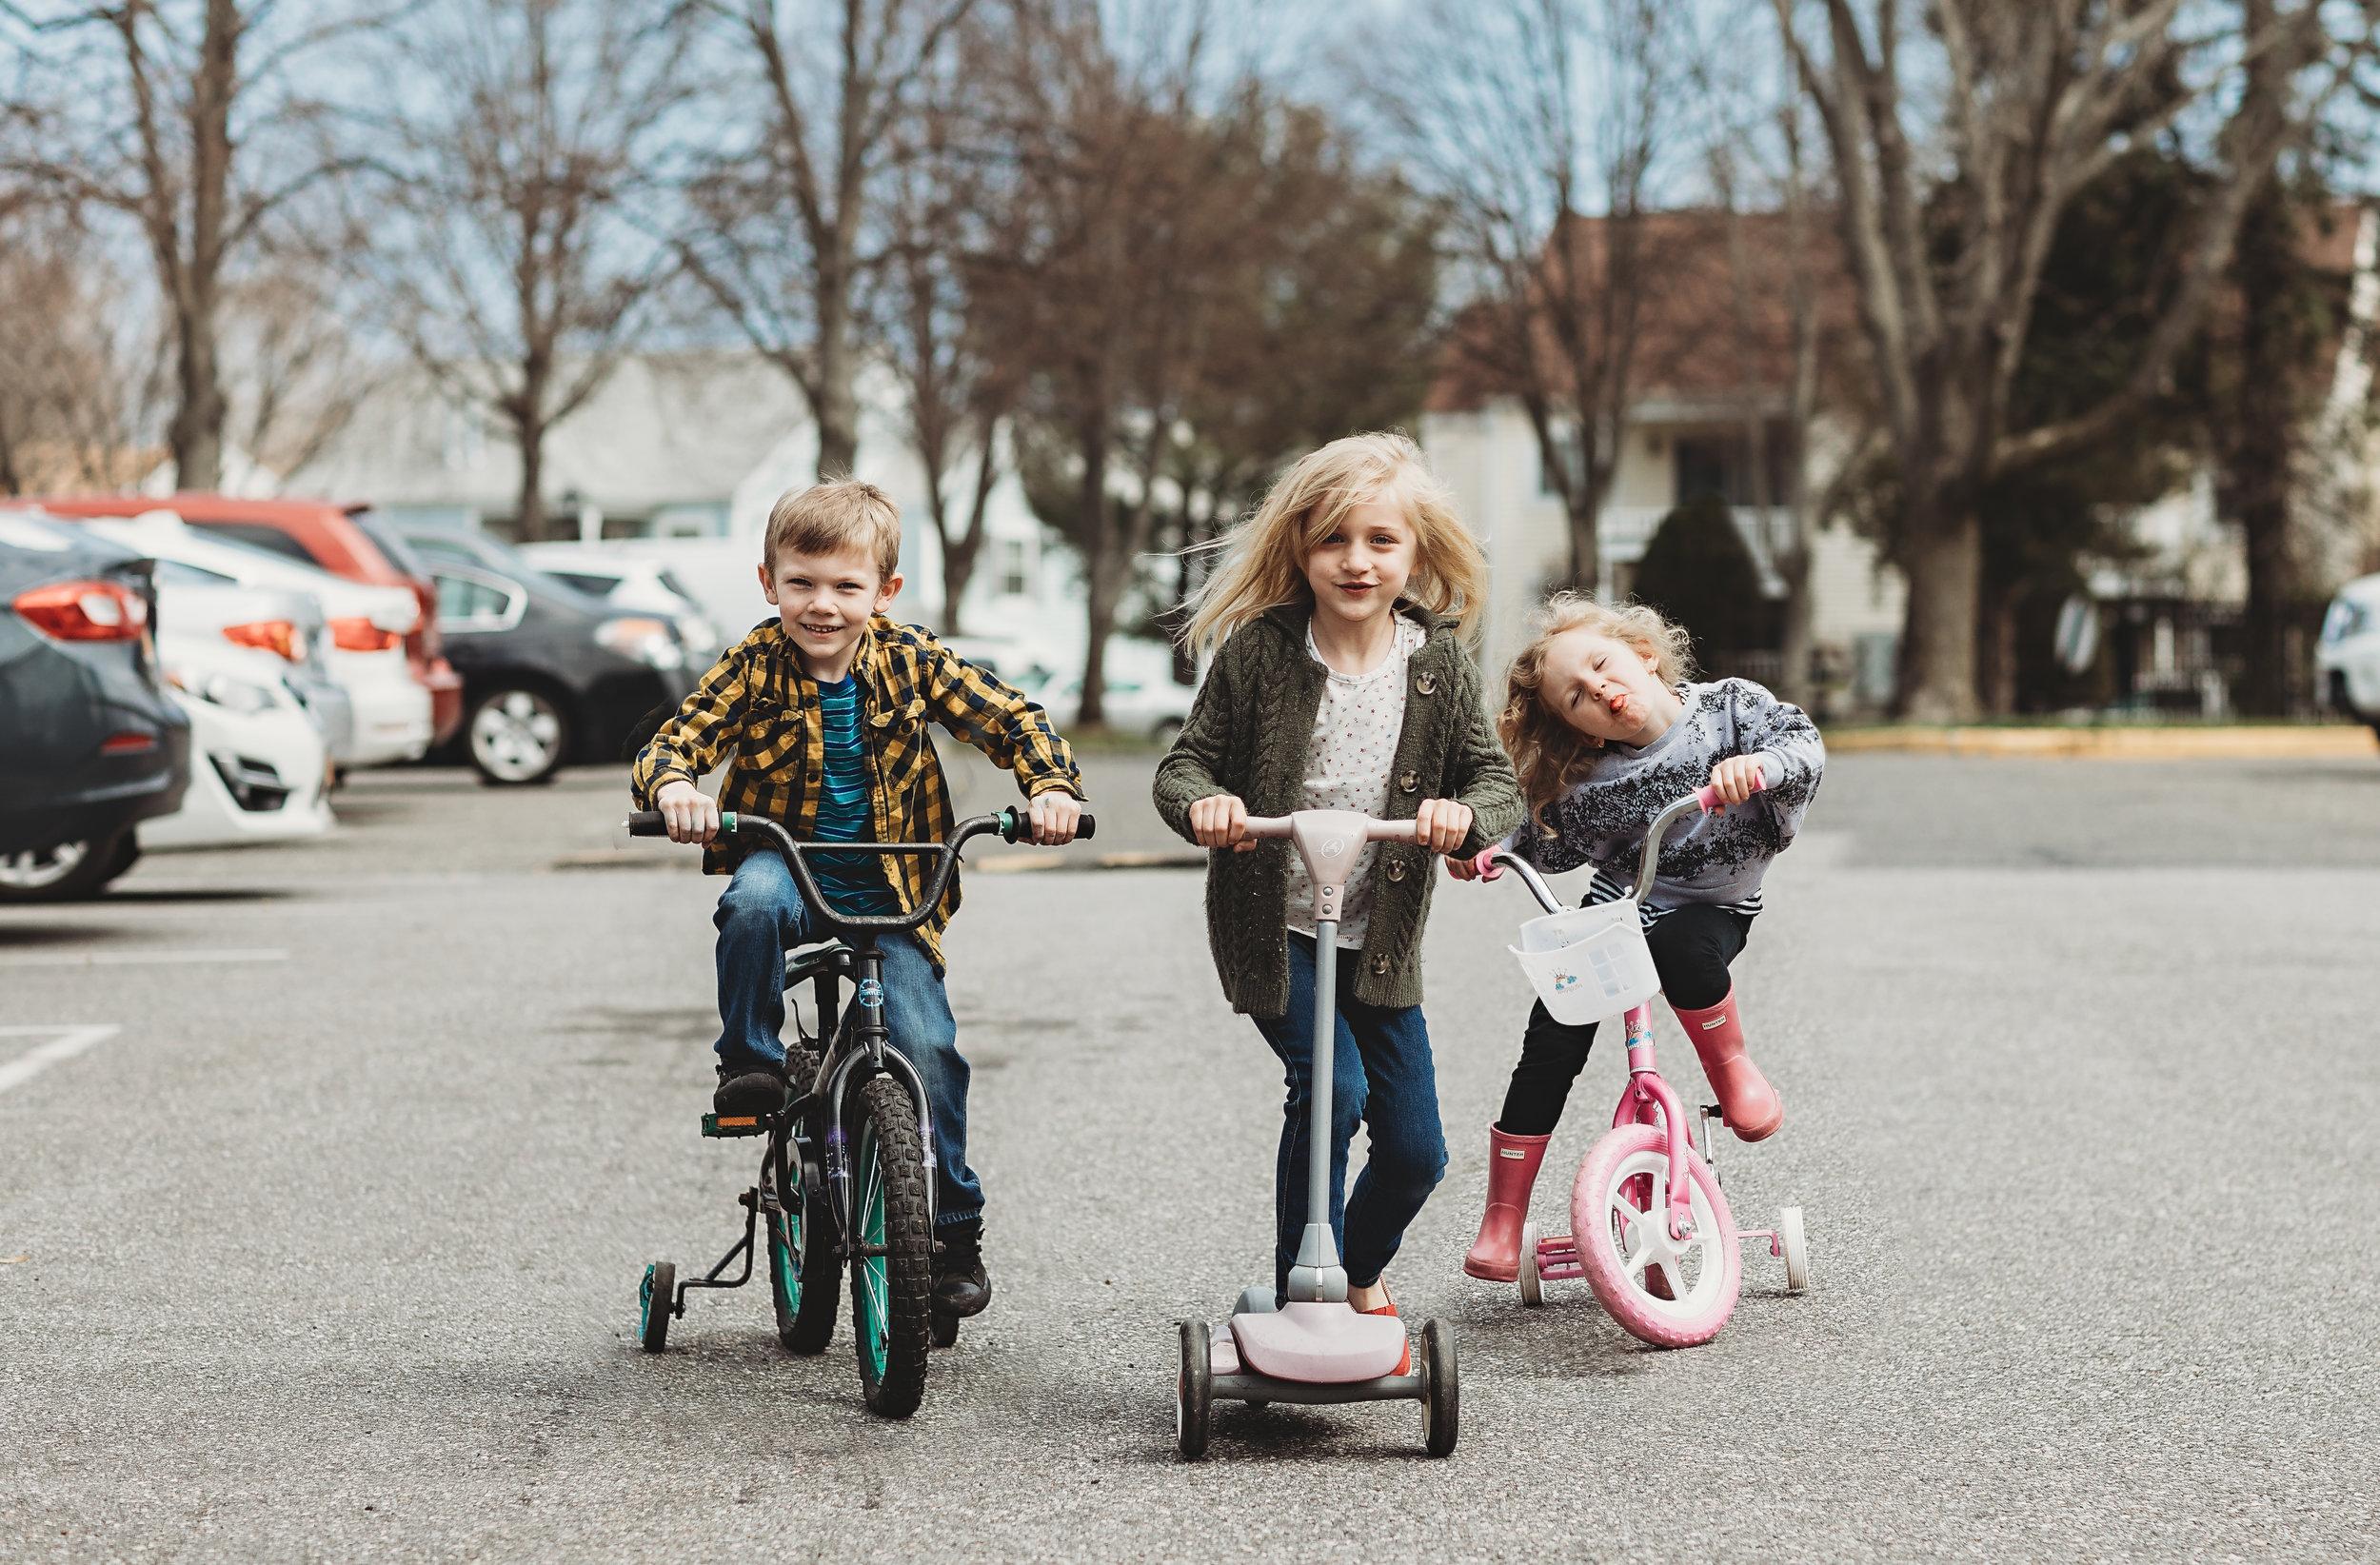 Hello-olivia-photography-Long-Island-photographer-documentary-kids-bicycle-silly-Suffolk-County.jpg